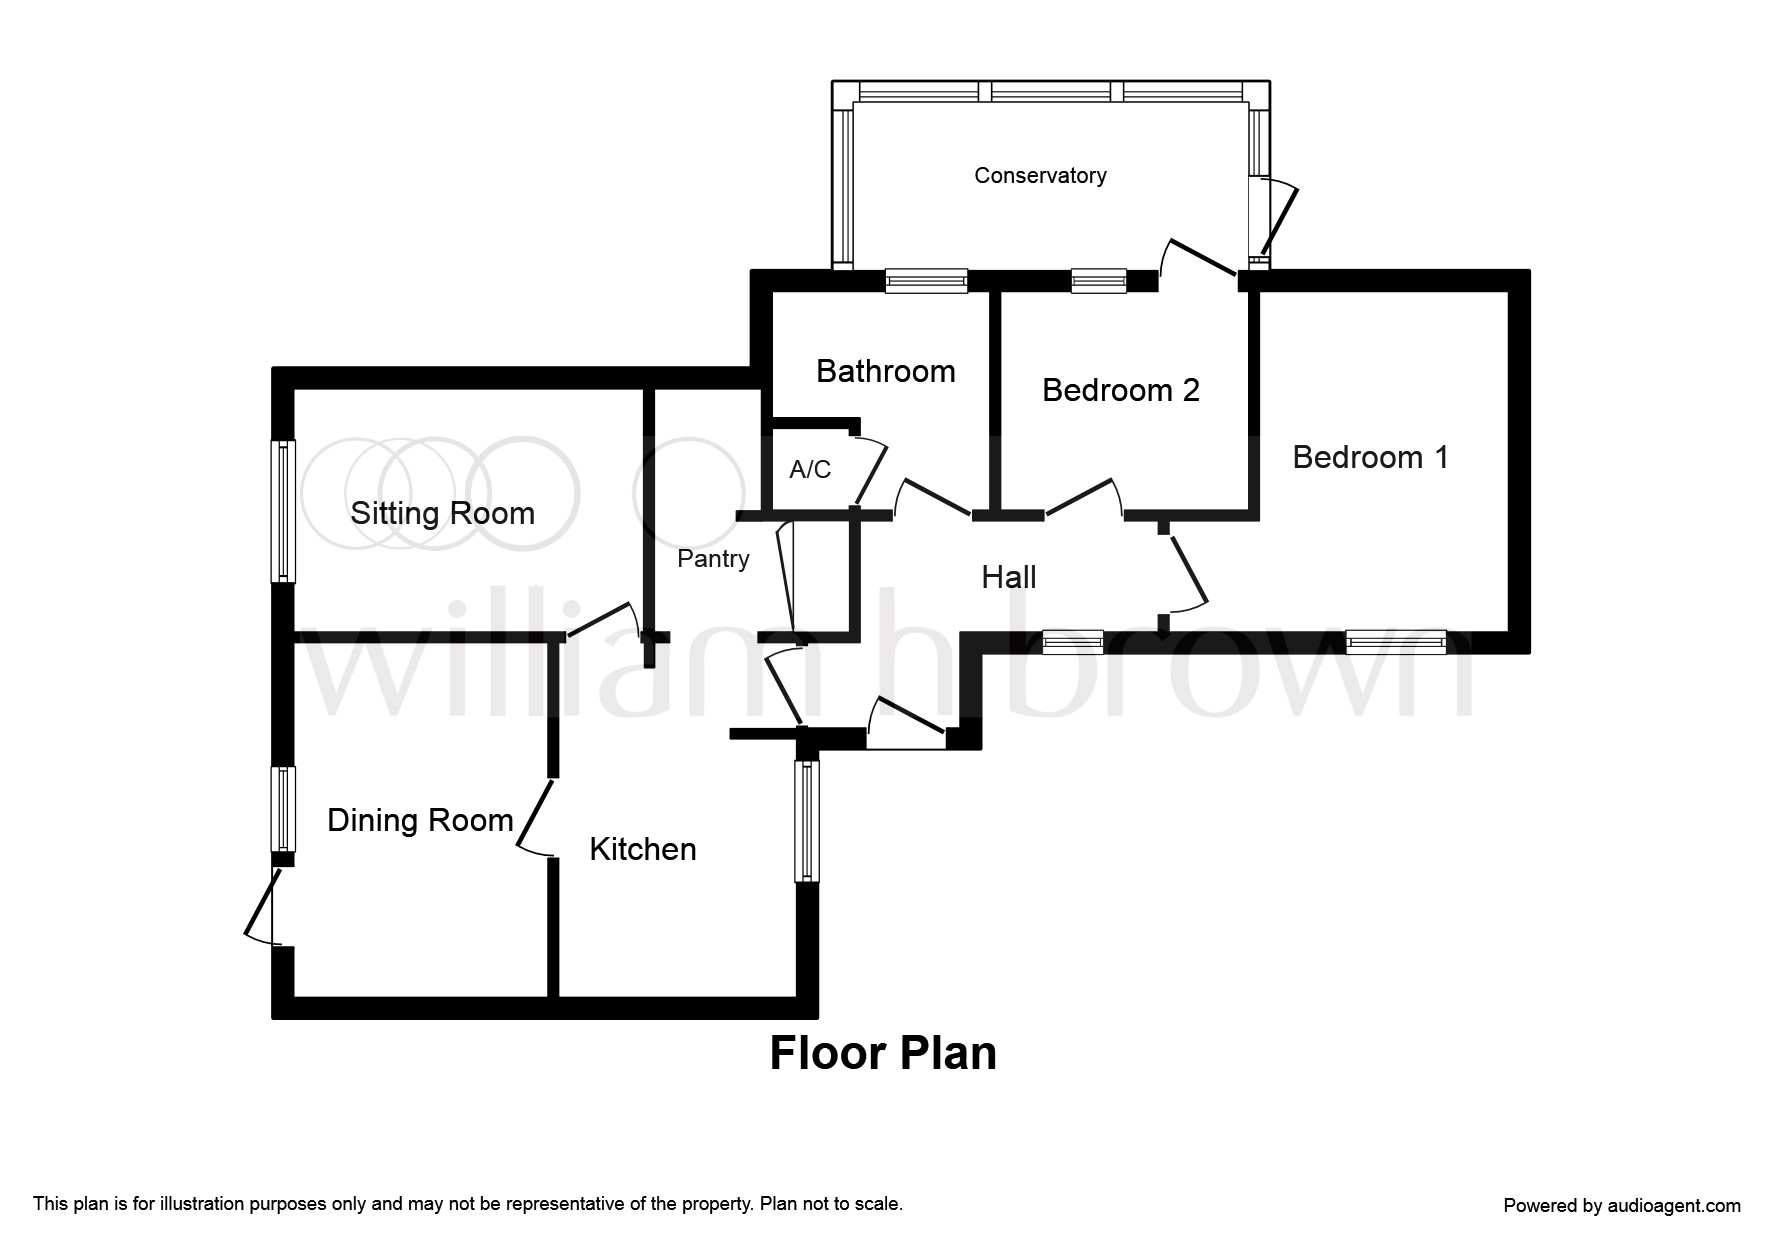 Tower Lane, Sidestrand, Cromer NR27, 2 bedroom bungalow